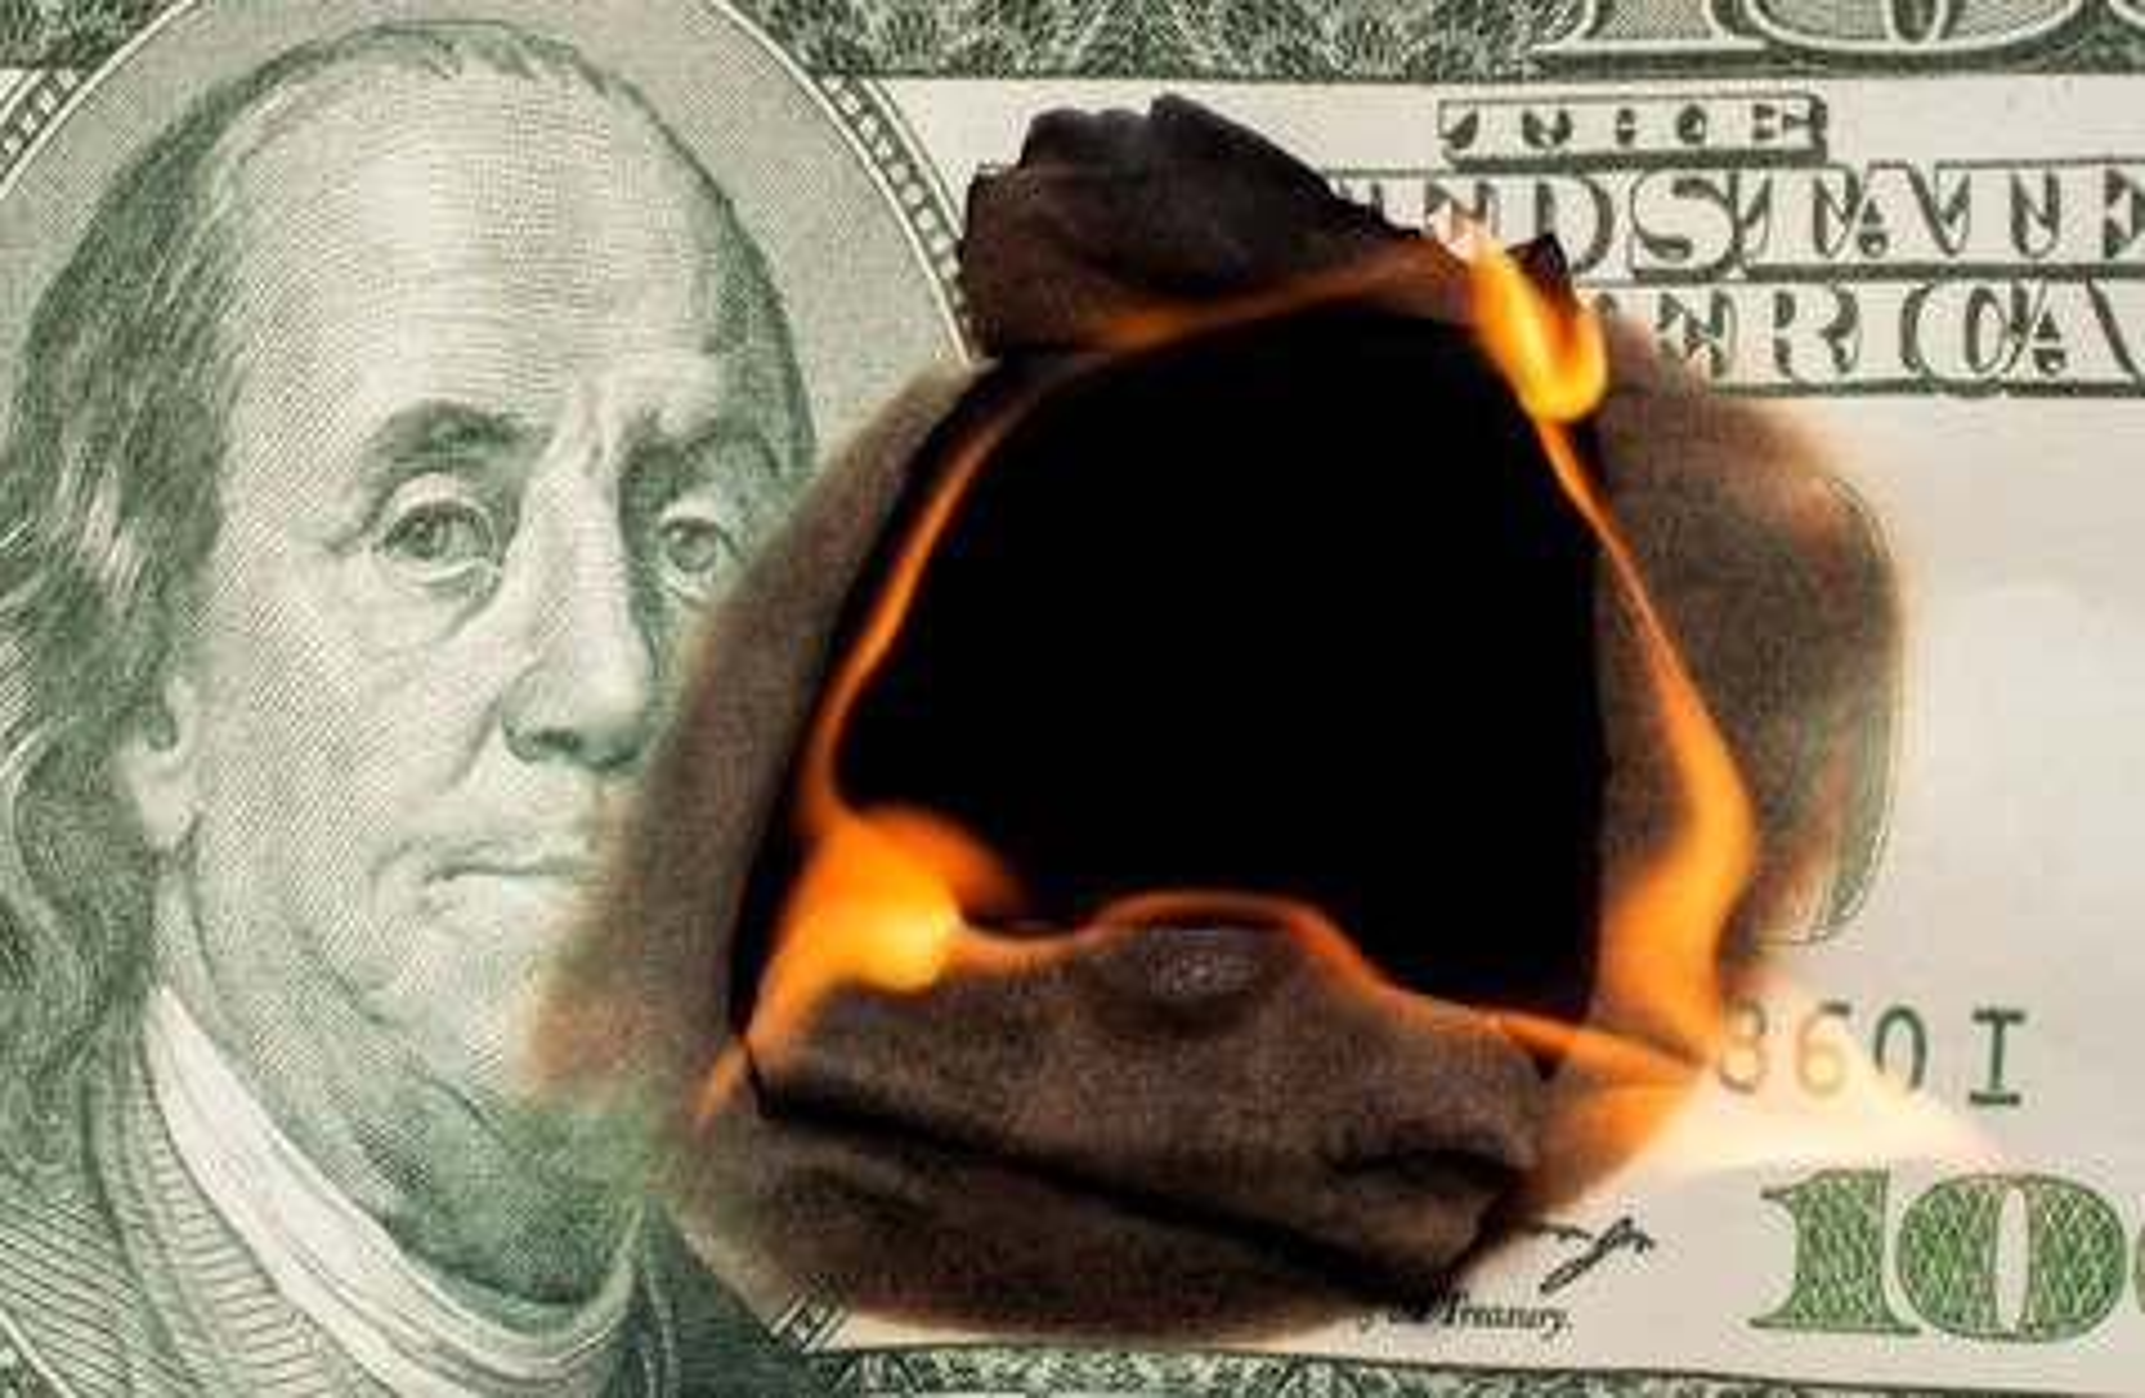 Hundred Dollar Bill on Fire Losing Money Investment Debt Credit Getty